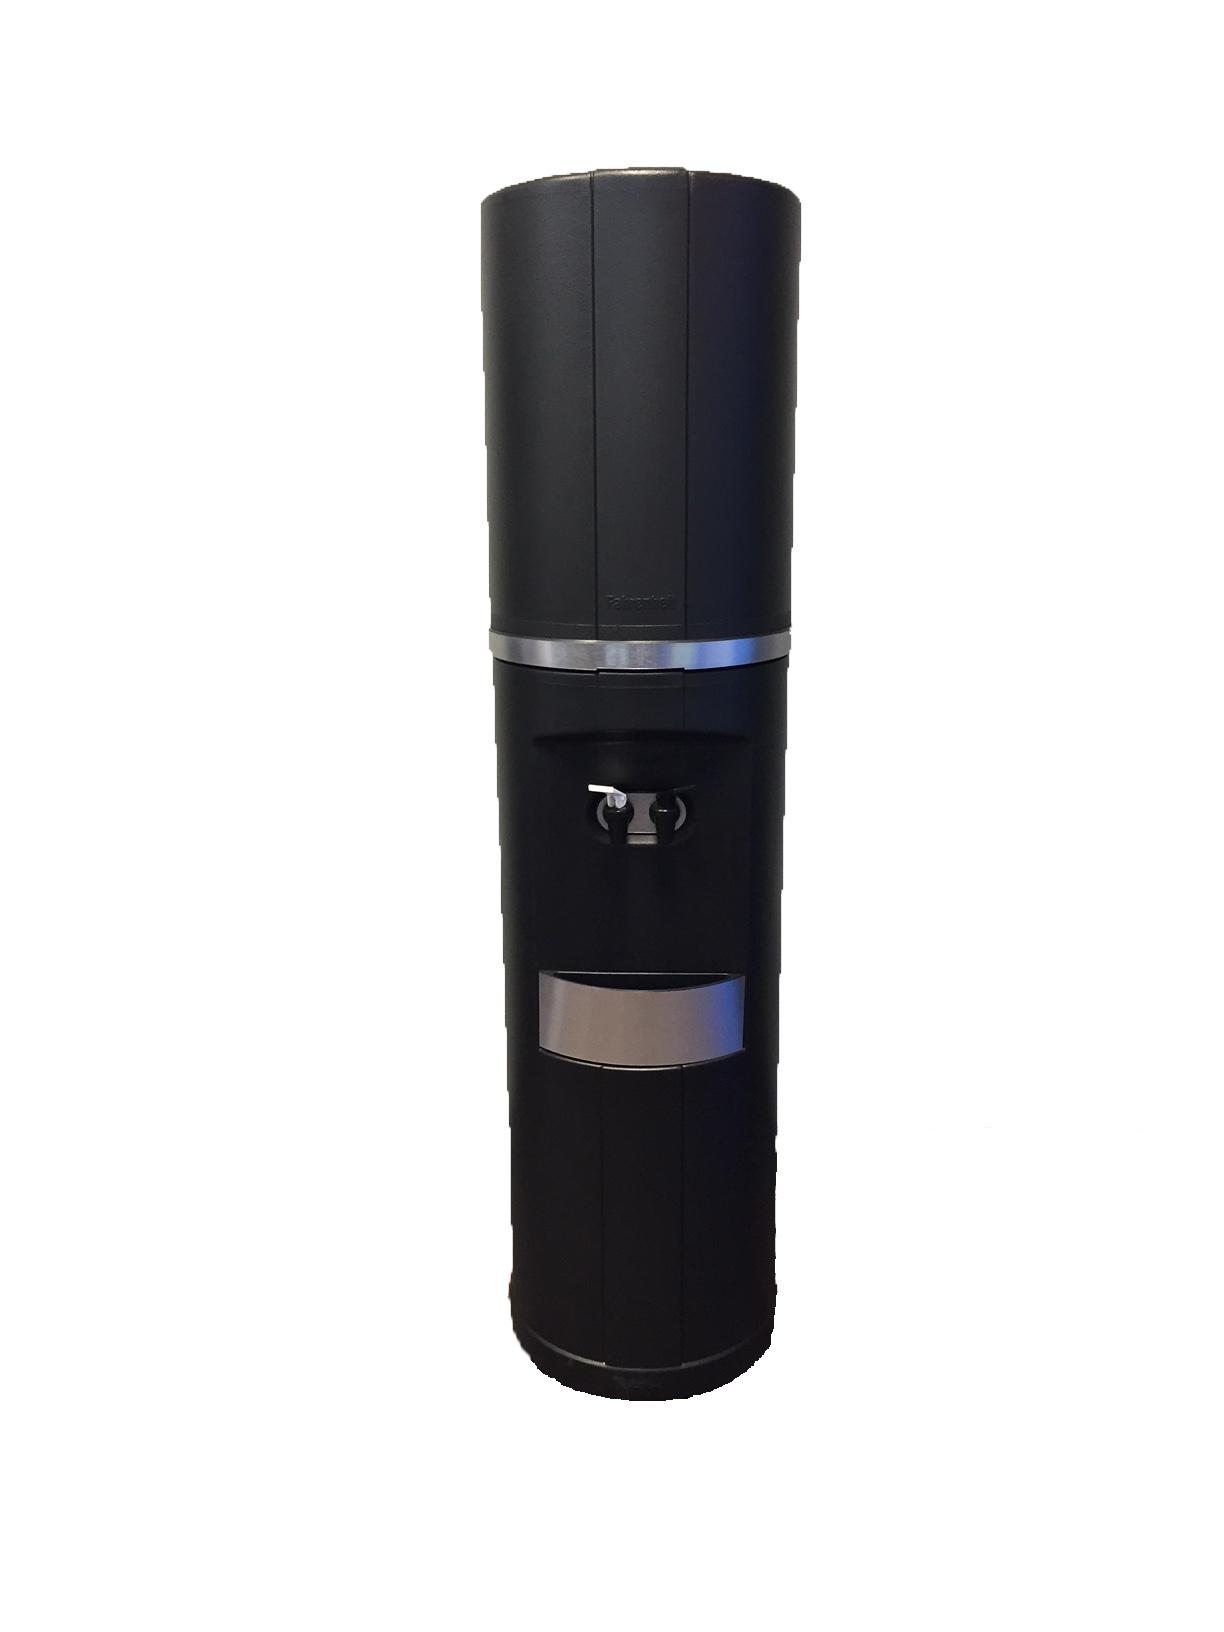 Fahrenheit Water Cooler - Black